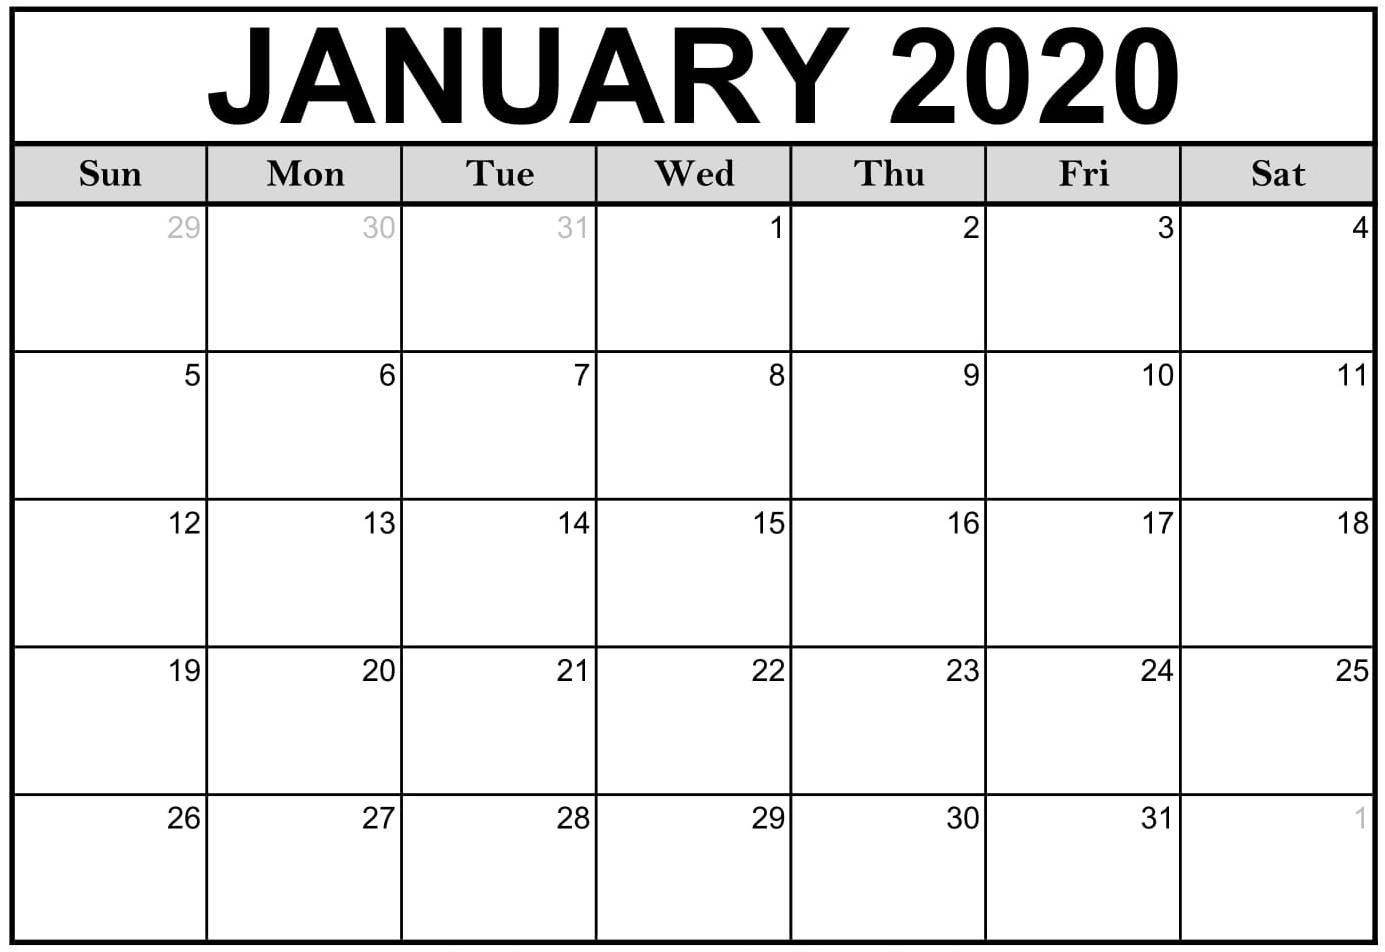 2020 Calendar Fillable | Free Printable Calendar Free Calendars That I Can Edit And Print